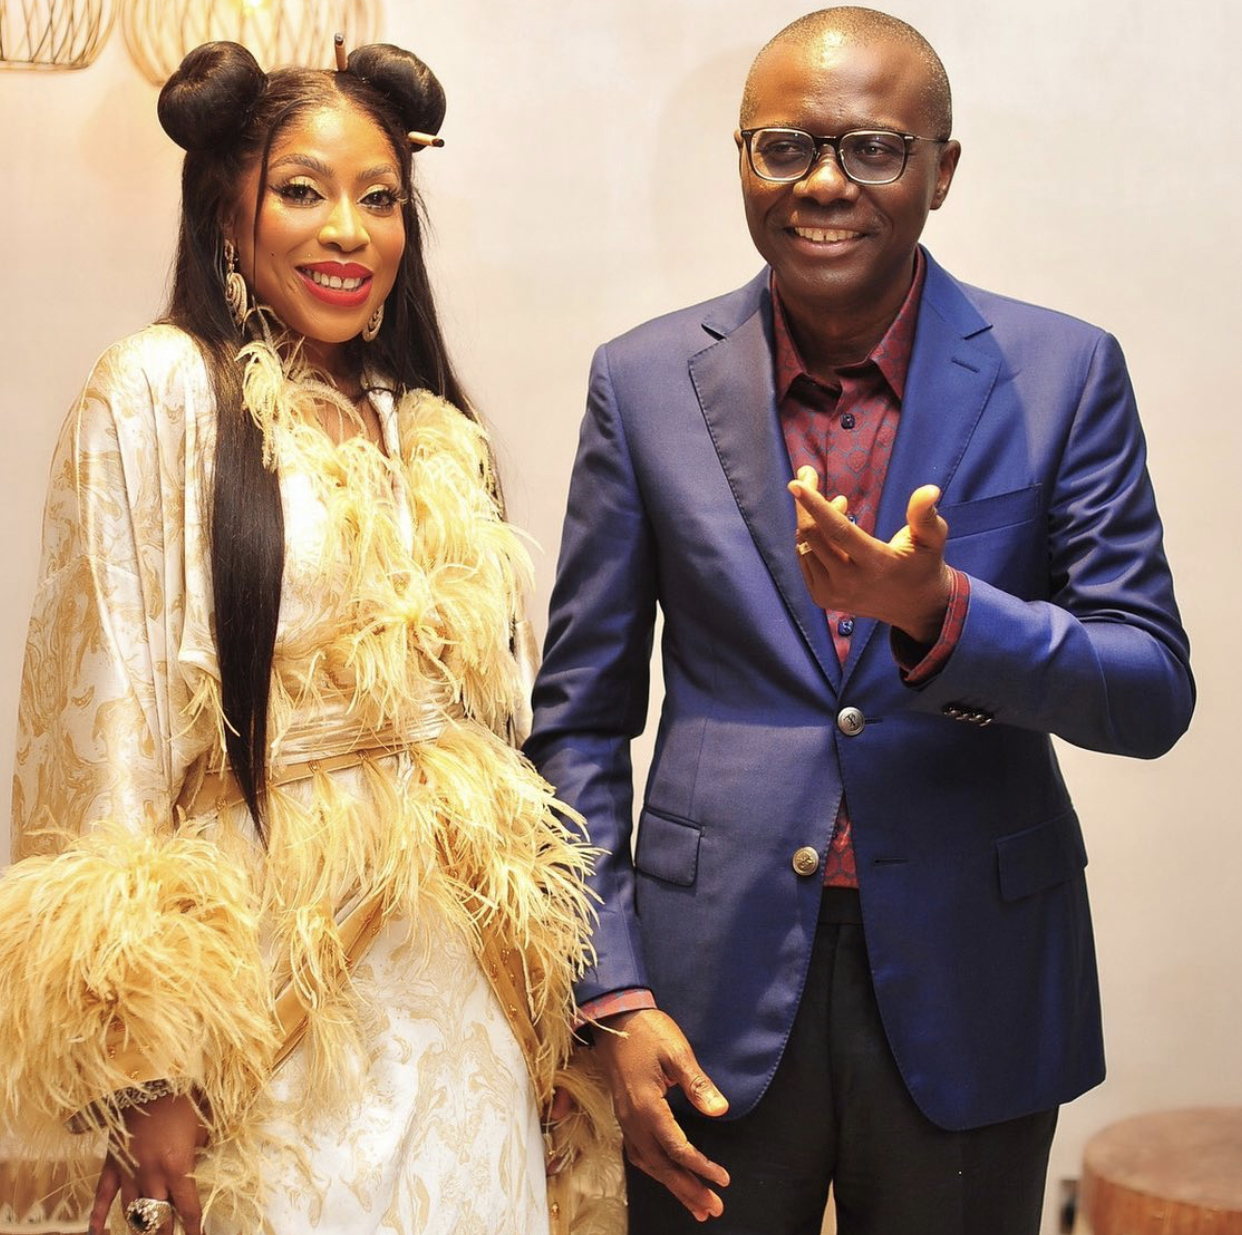 CEO of EbonyLife, Mo Abudu and Governor Babajide Sanwo-Olu of Lagos State